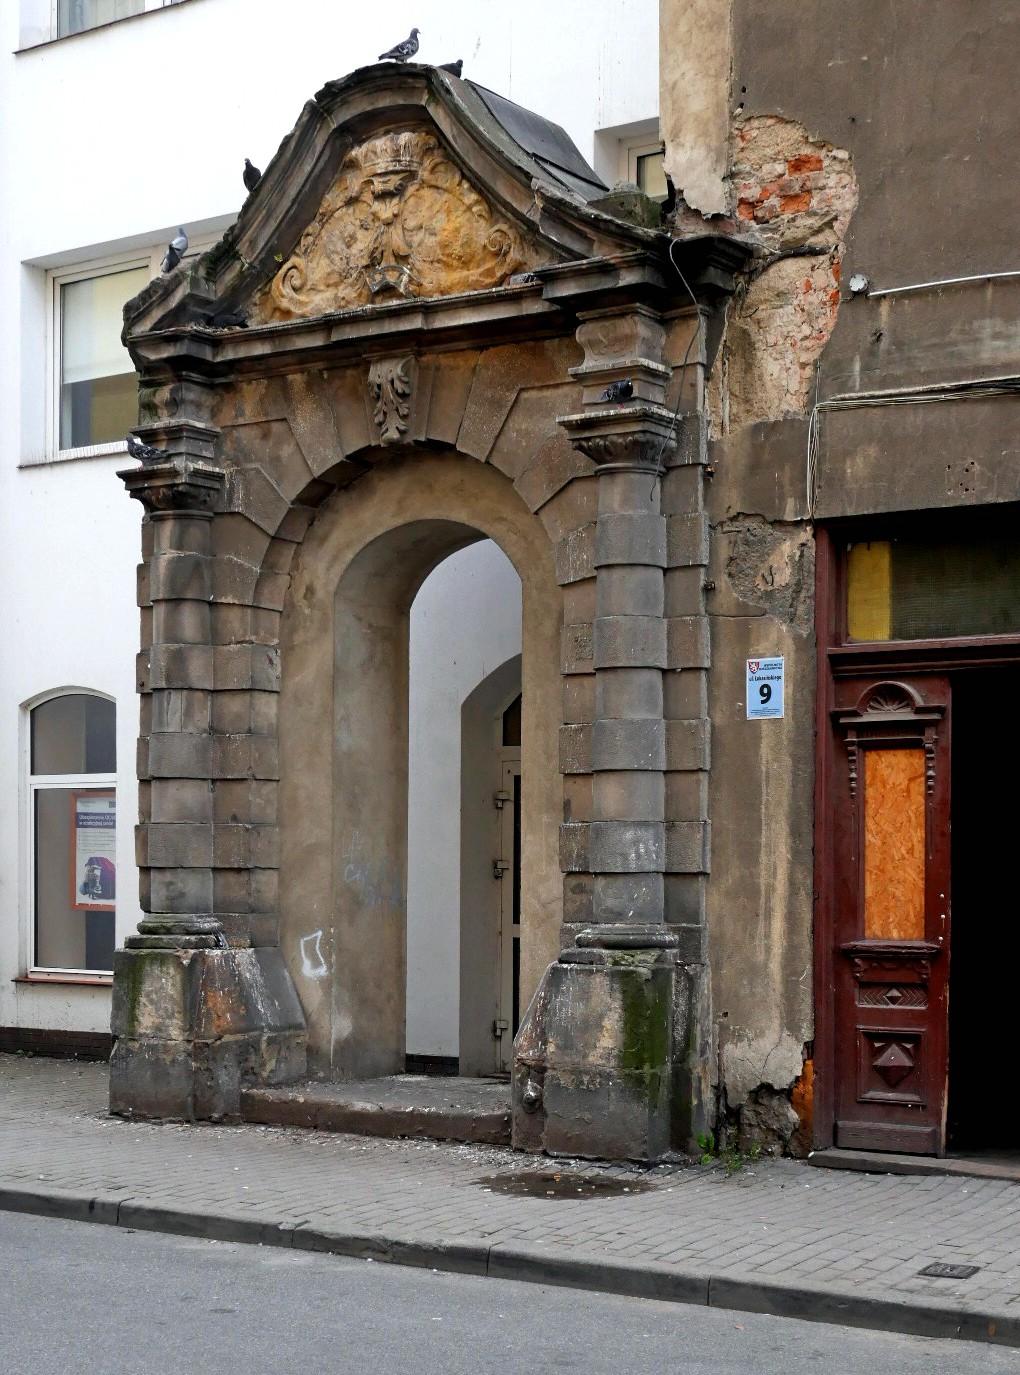 A gate to modernity...